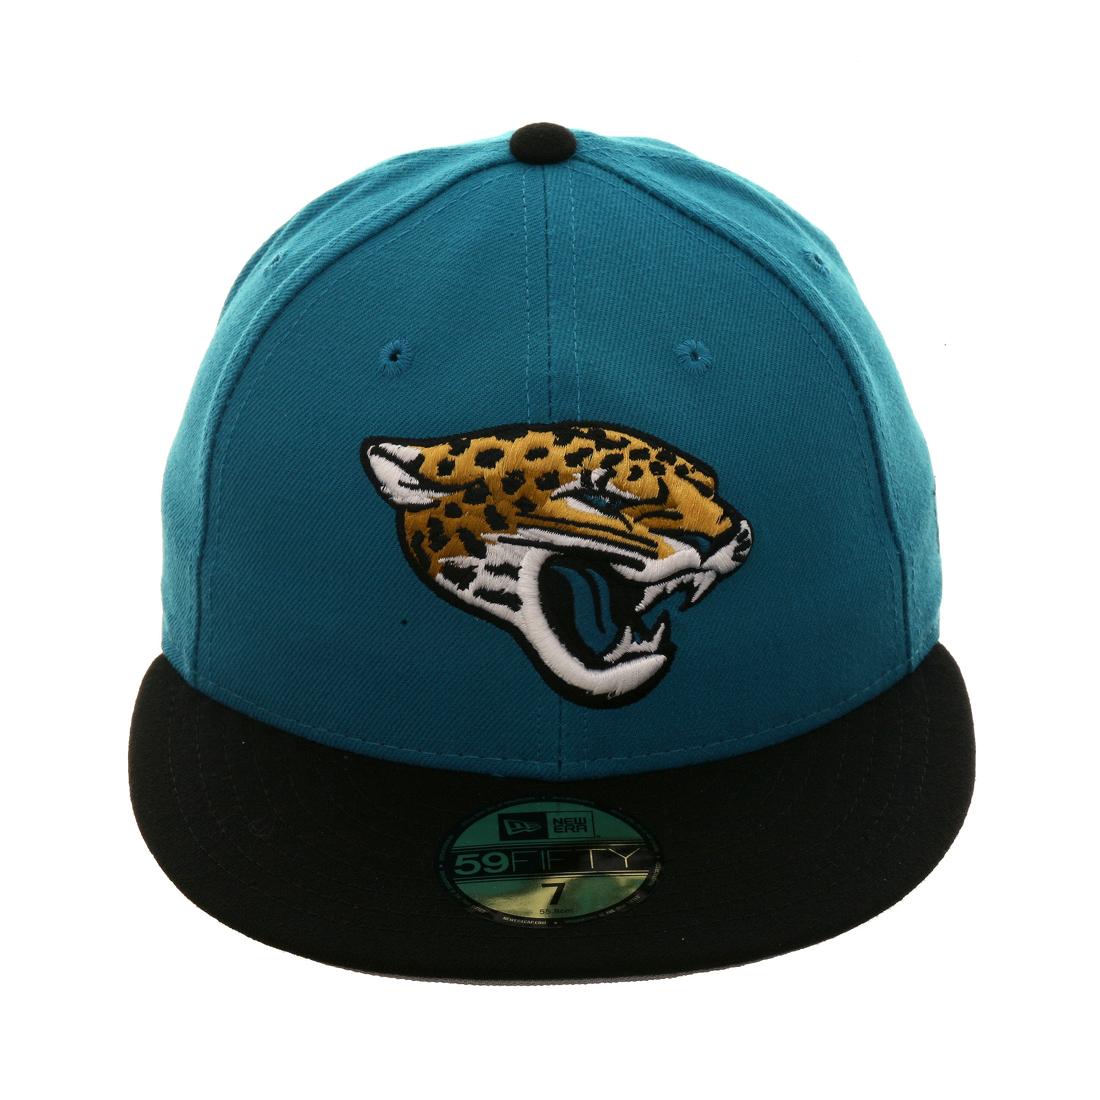 7ea630748a1 Exclusive New Era 59Fifty Jacksonville Jaguars Hat - 2T Teal